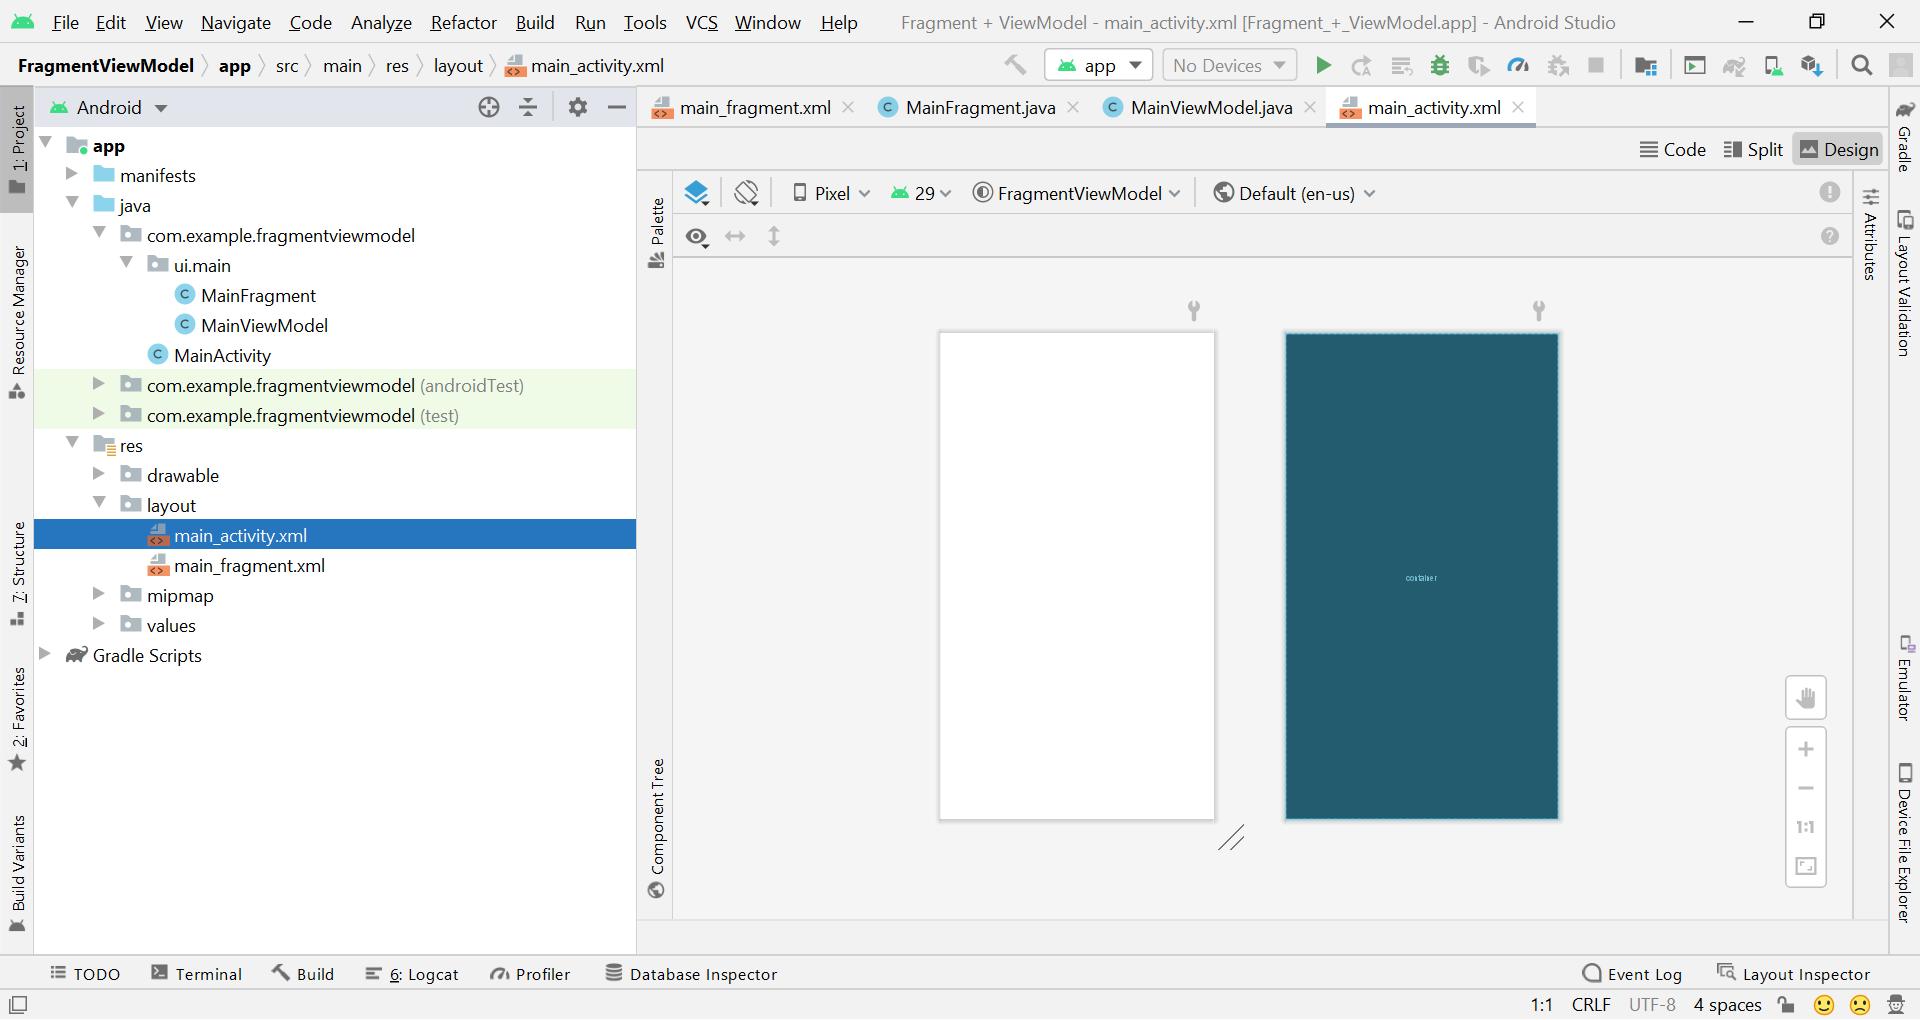 Fragment + ViewModel